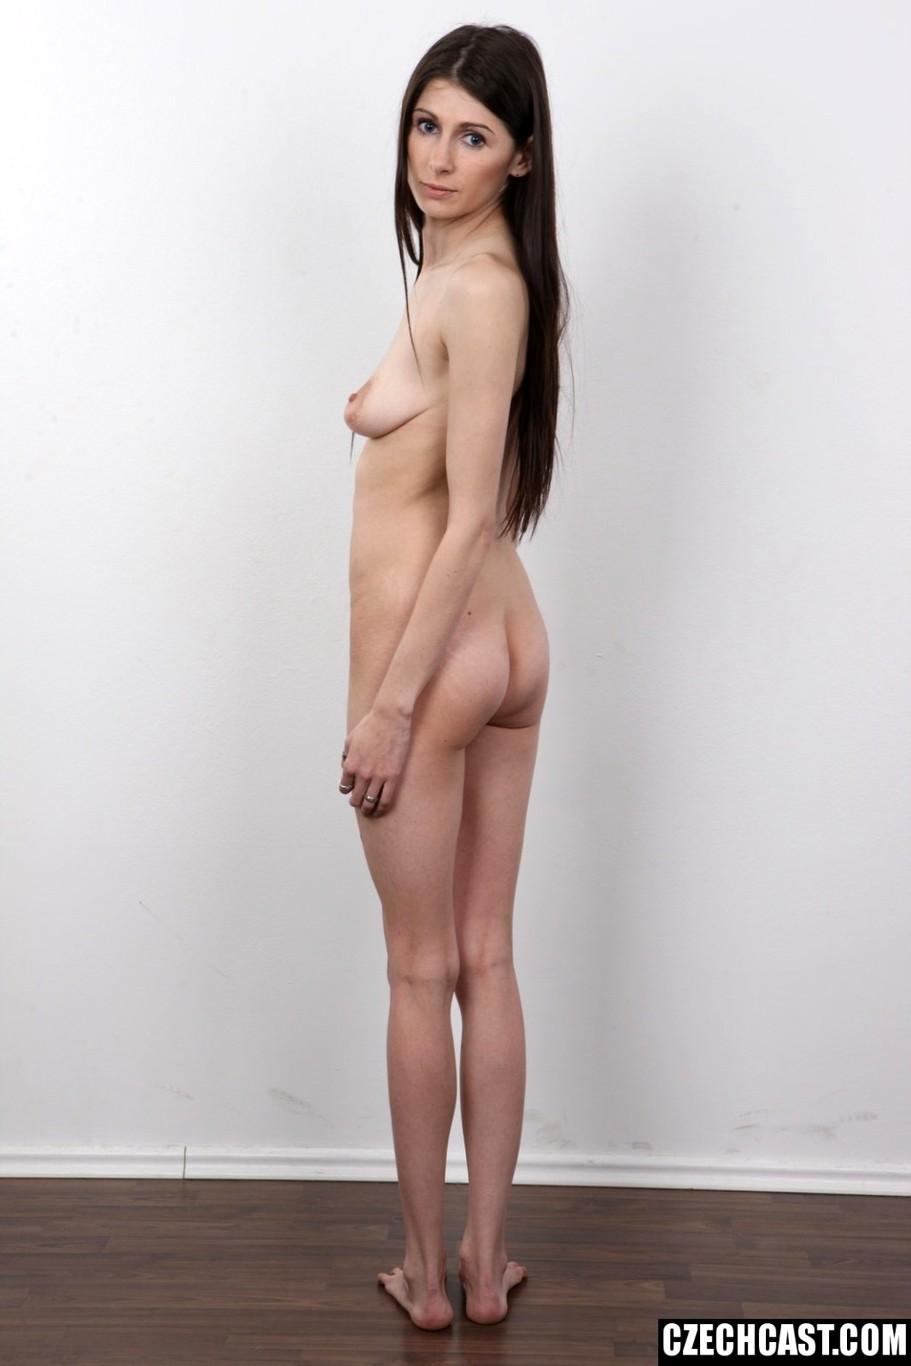 Amateur Fake Photographer Makes Stripping Models Porn czechcasting model profil stripping pic porn - megapornx